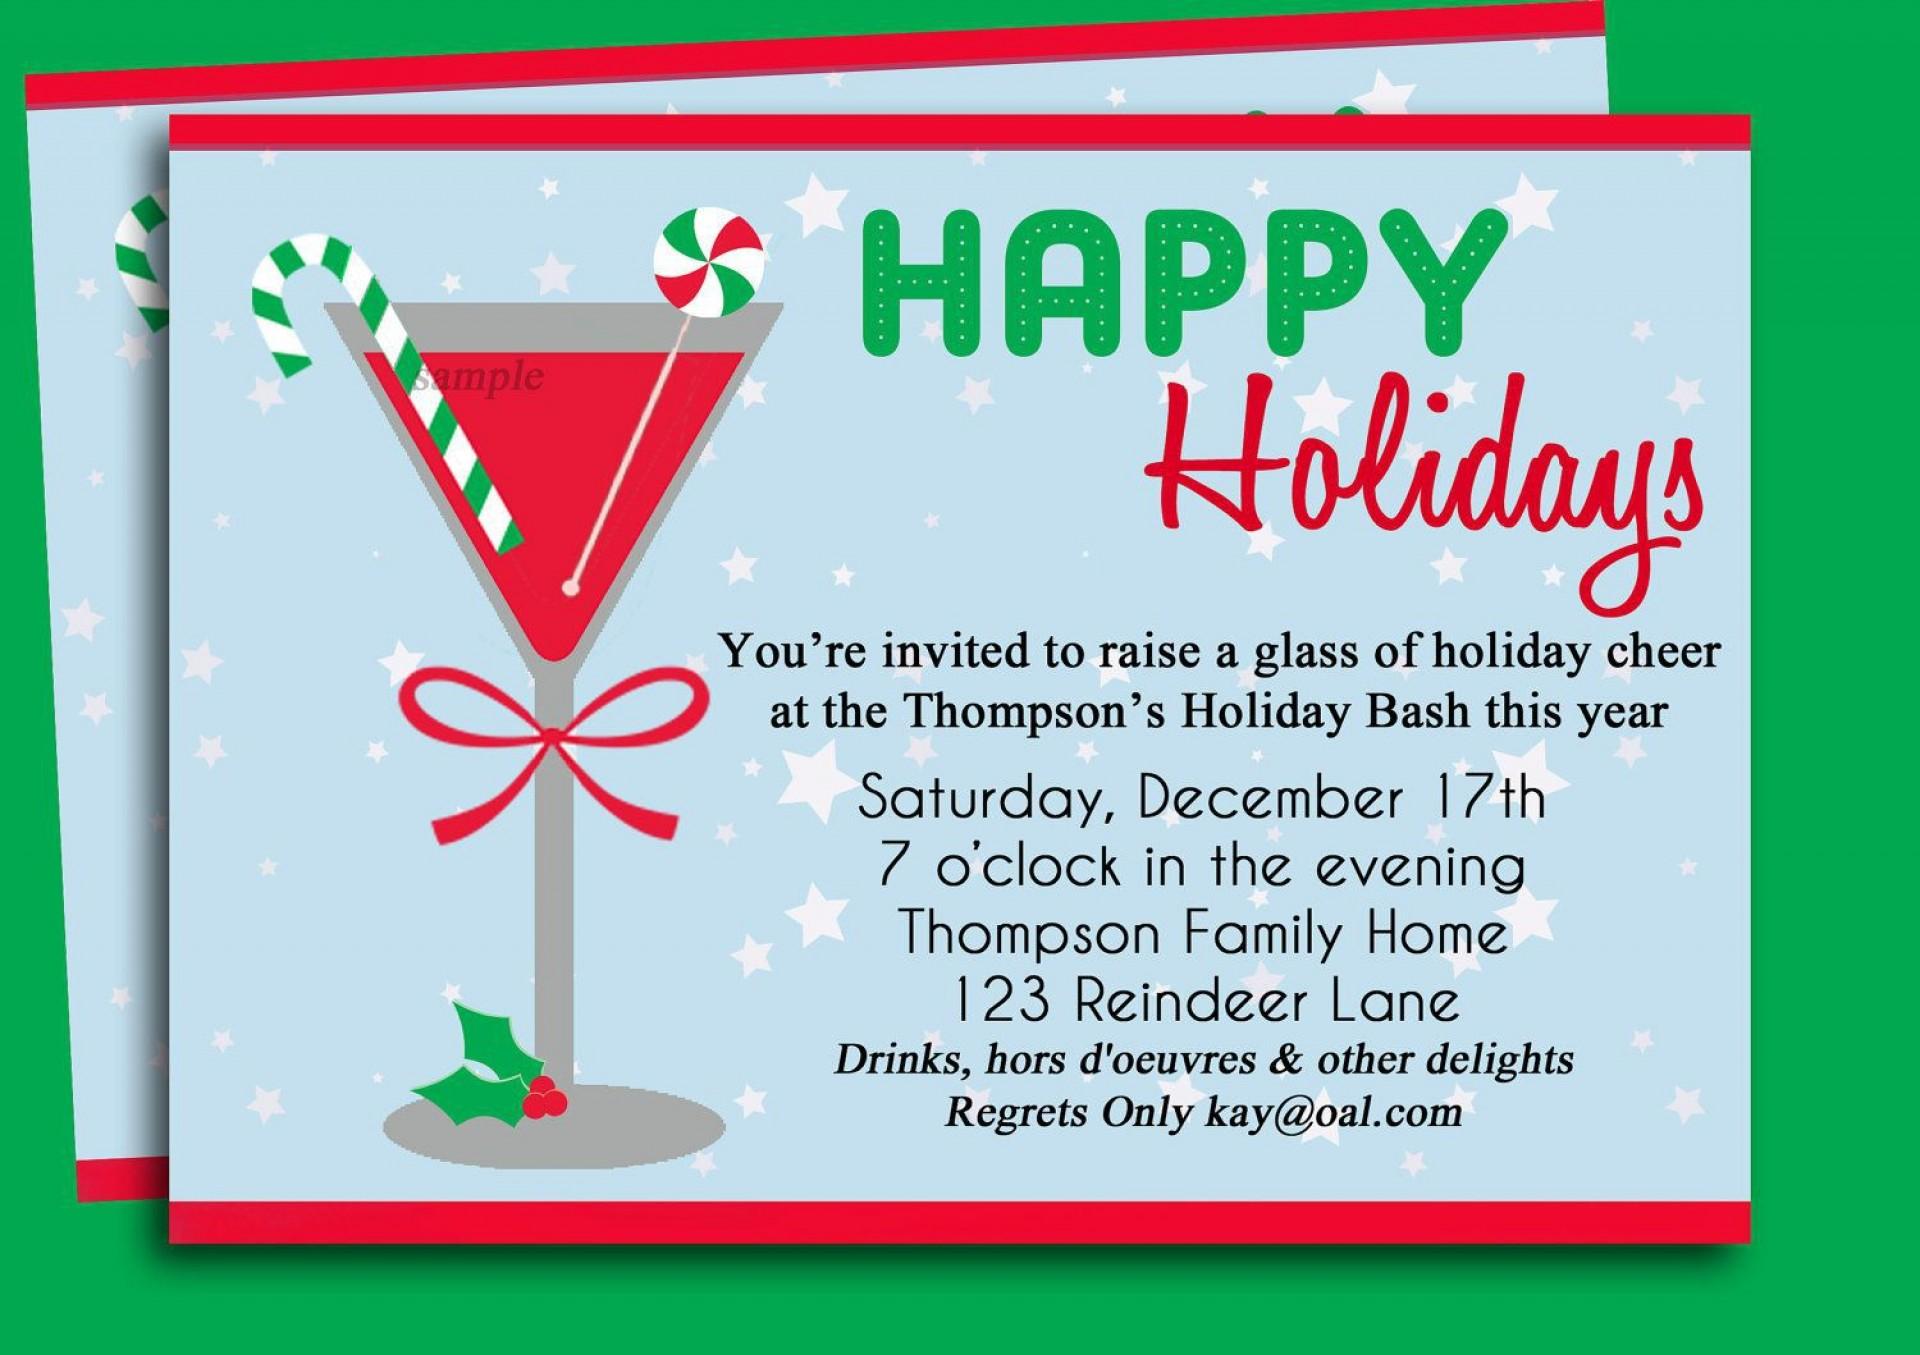 002 Impressive Holiday Open House Invitation Template High Resolution  Christma Free Printable Wording Idea1920